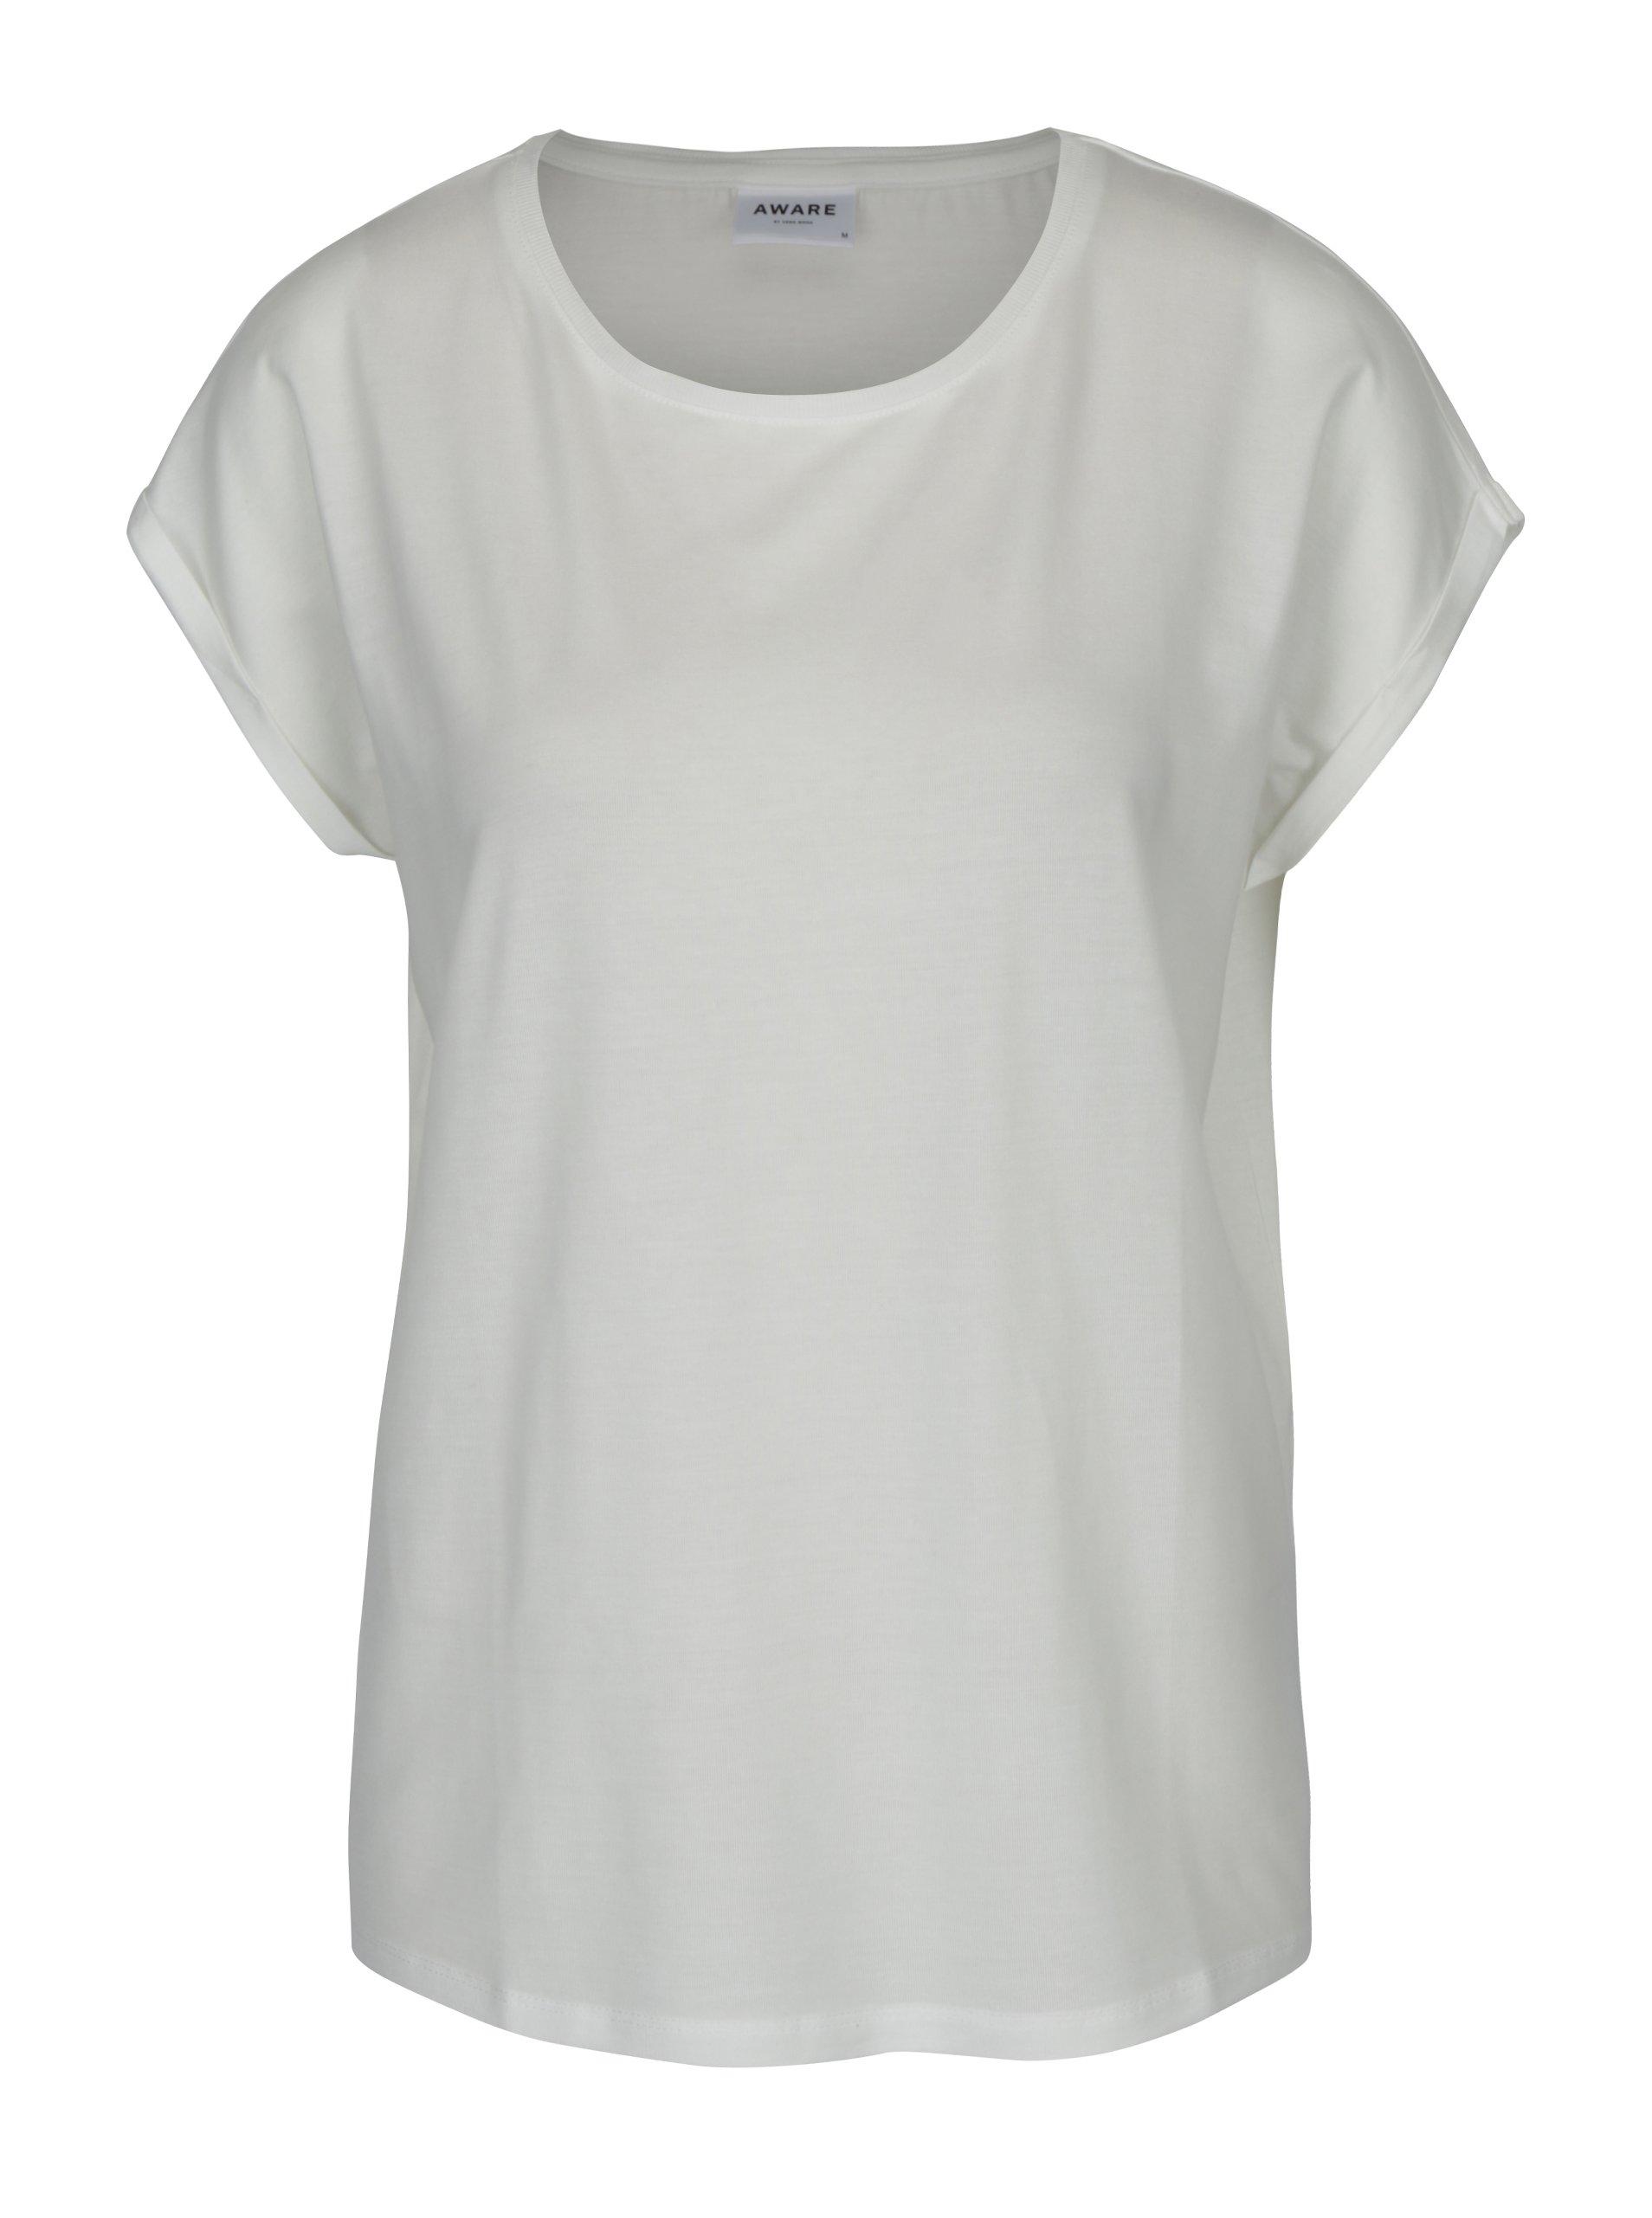 Fotografie Krémové dámské basic tričko s krátkým rukávem AWARE by VERO MODA Ava